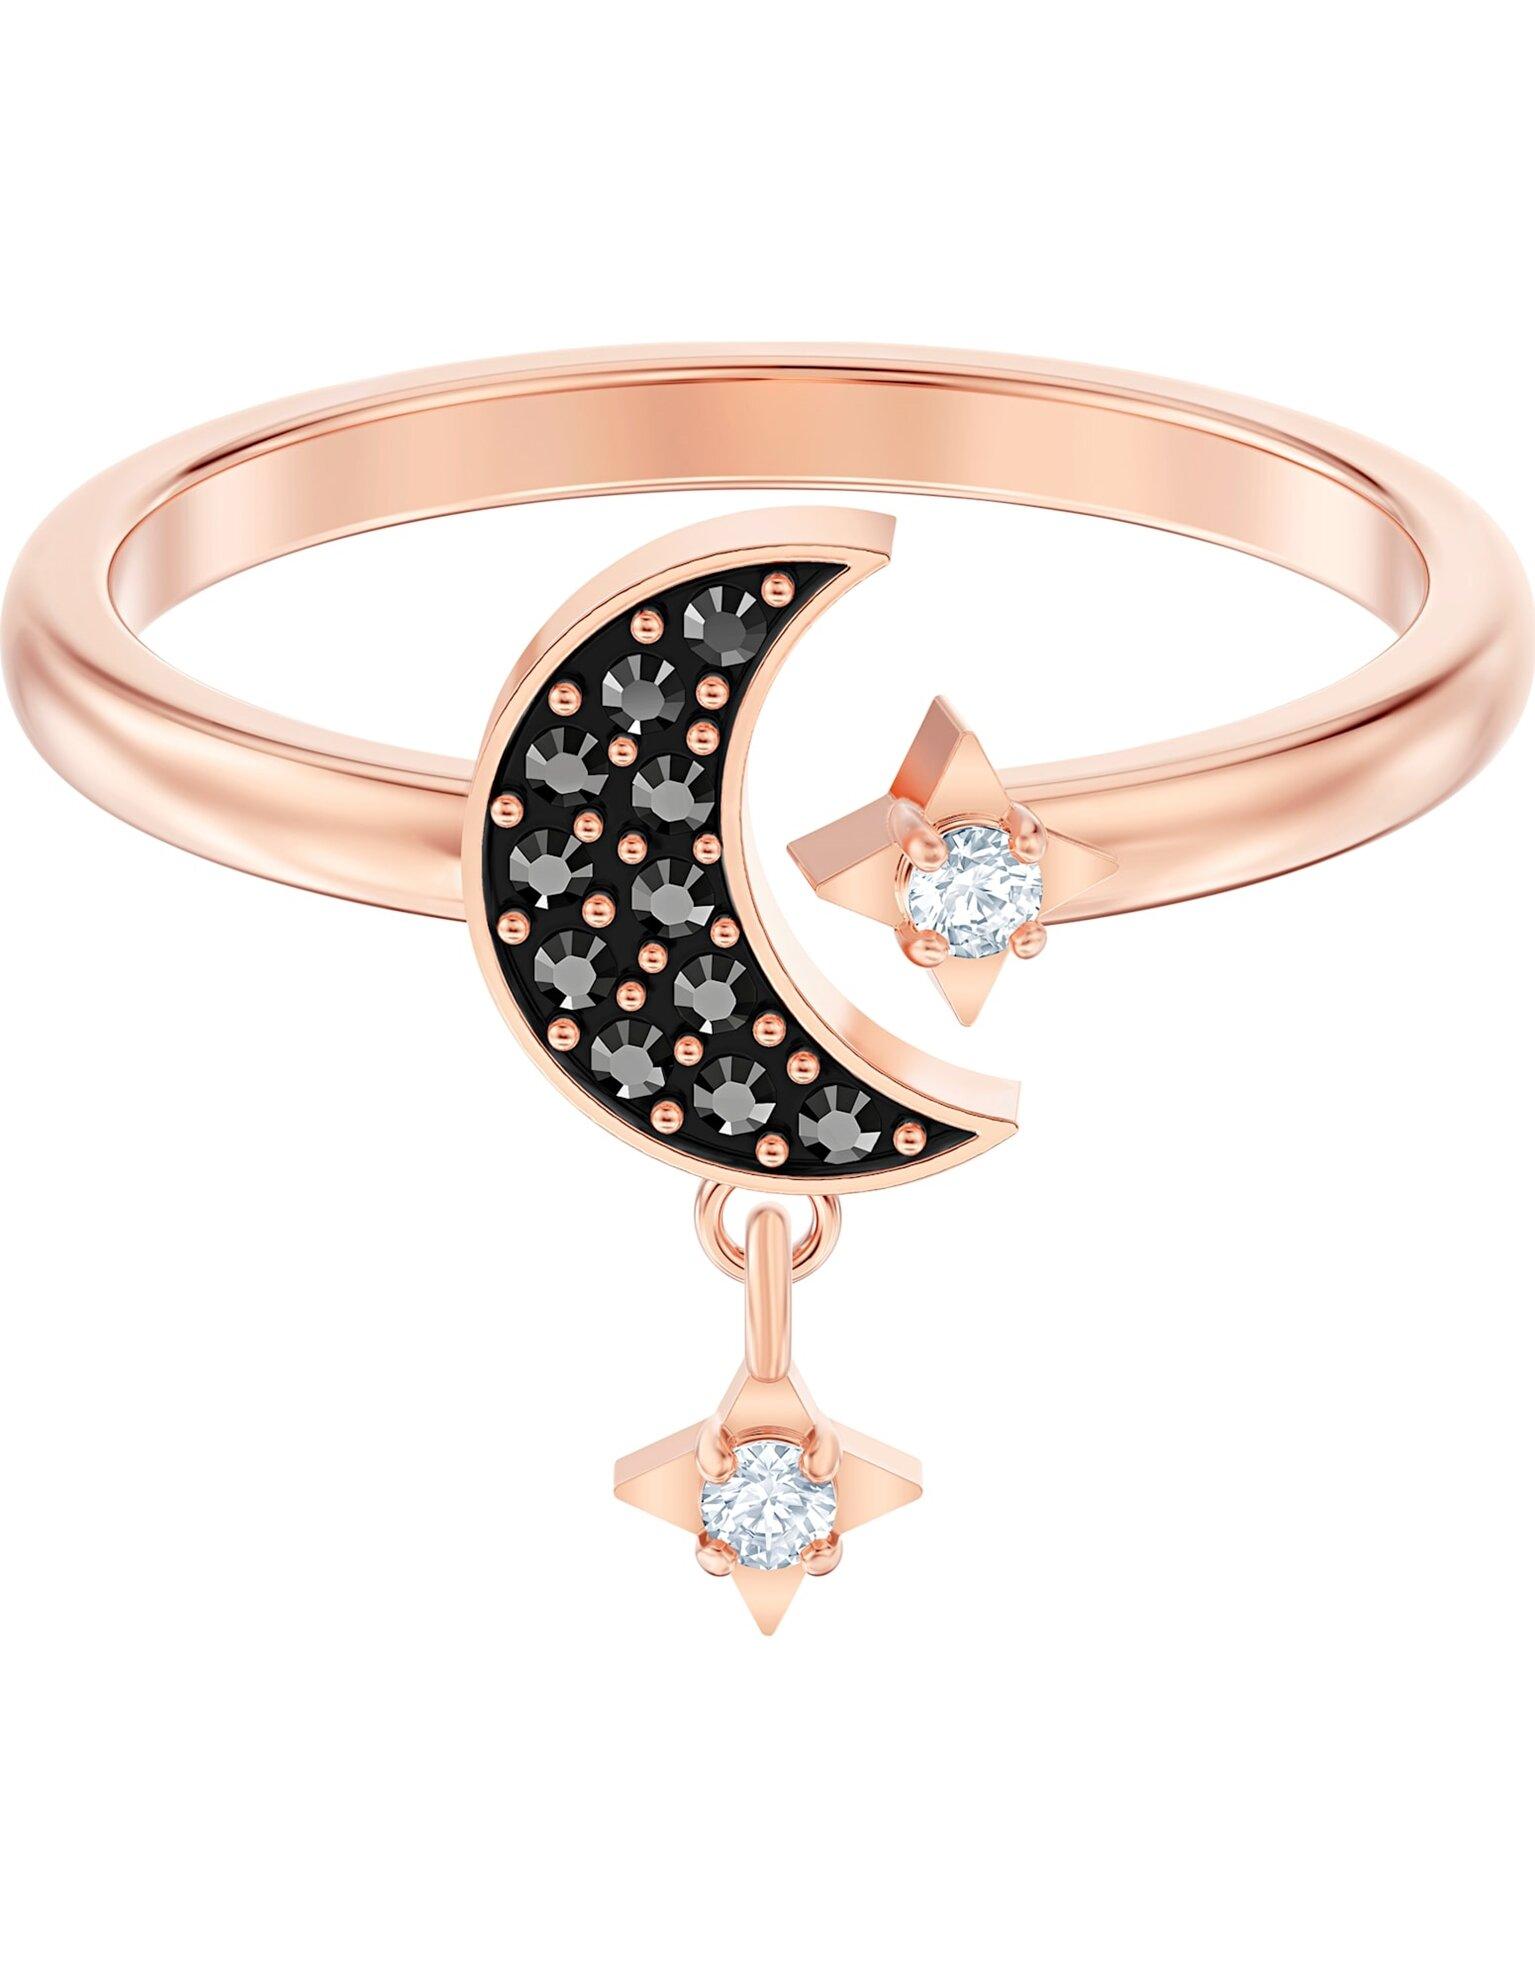 Picture of Swarovski Symbolic Moon Motif Yüzük, Siyah, Pembe altın rengi kaplama